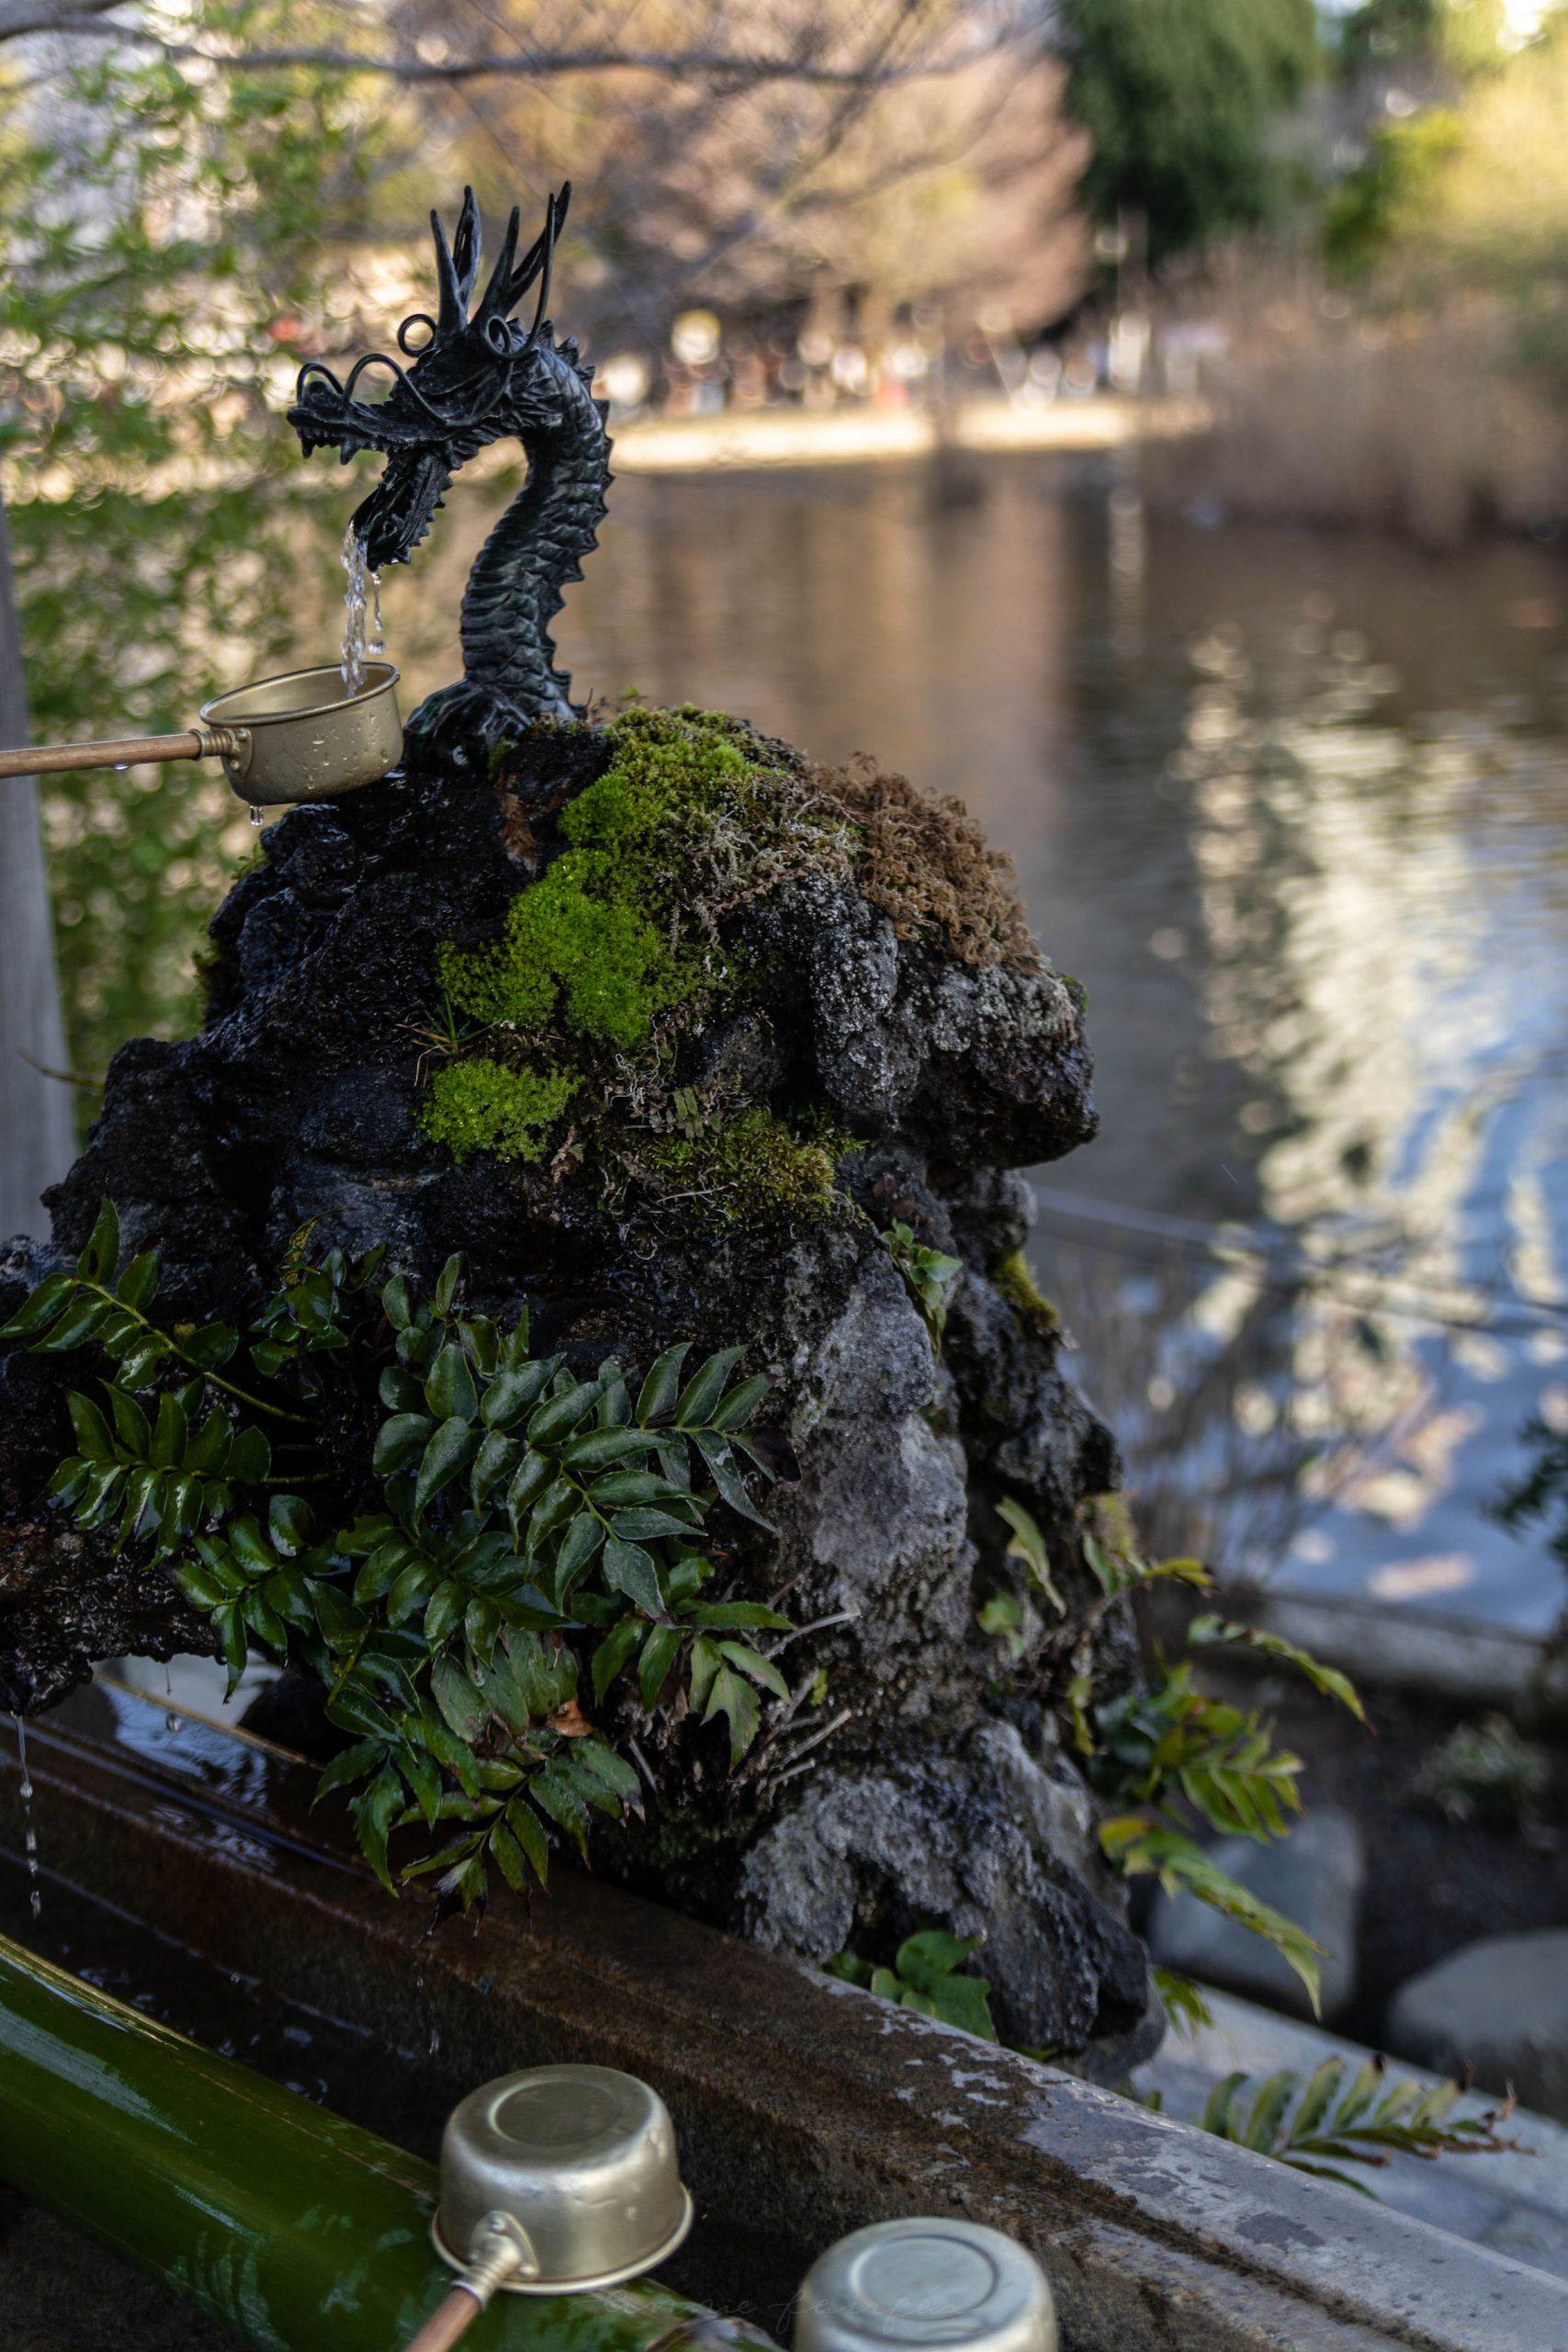 Chozuya Water Ablution Purification Ritual in Tokyo by Annie Fairfax